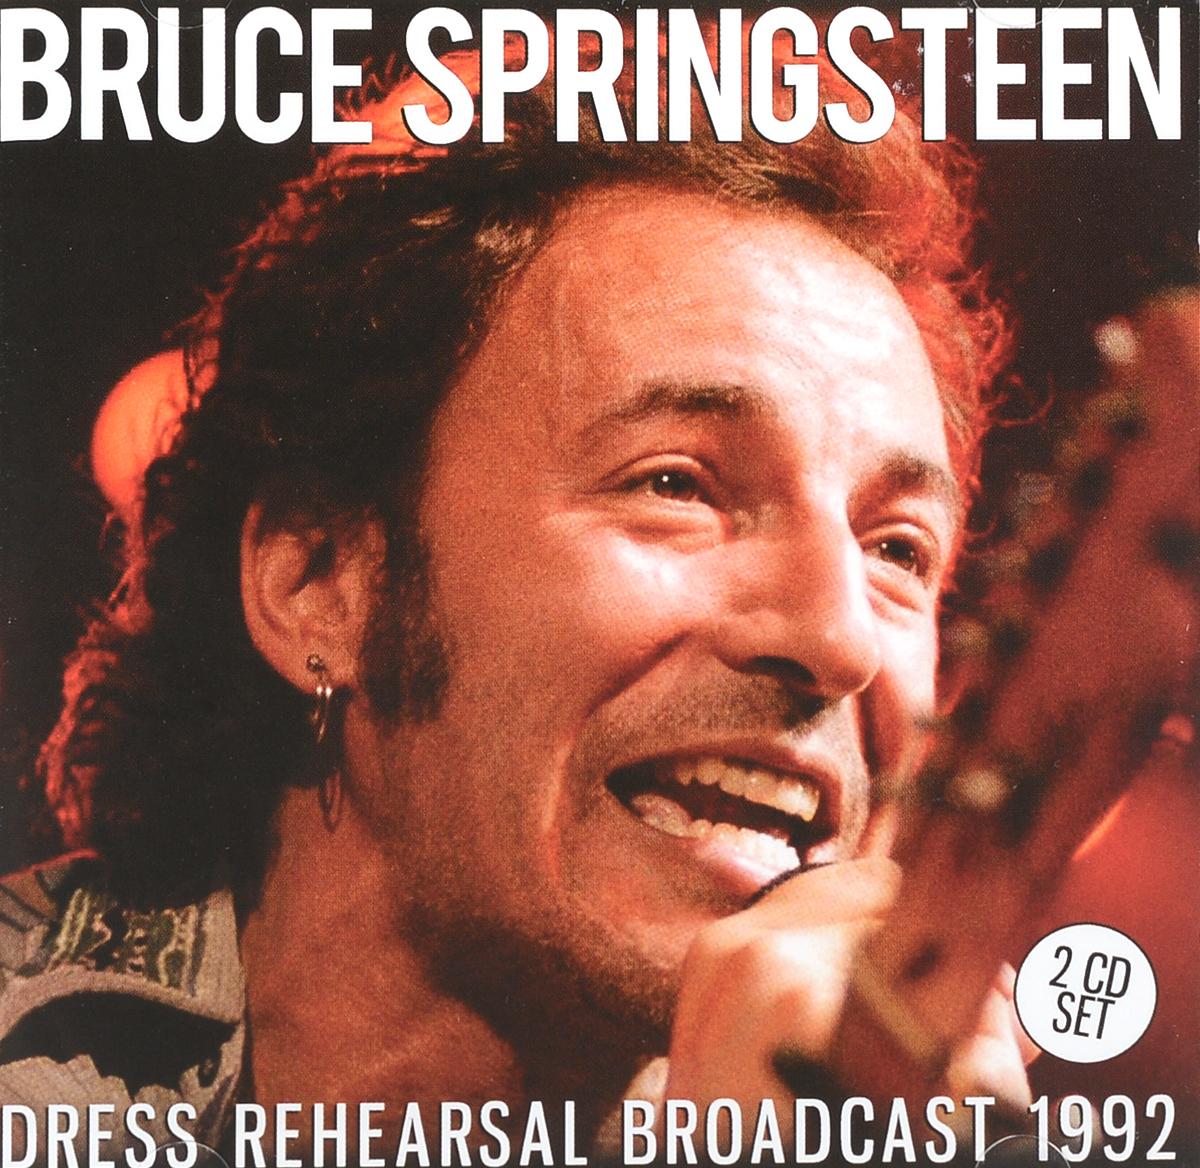 Брюс Спрингстин Bruce Springsteen. Dress Rehearsal Broadcast 1992 (2 CD) брюс спрингстин bruce springsteen passaic night 1978 the classic new jersey broadcast volume two 2 lp